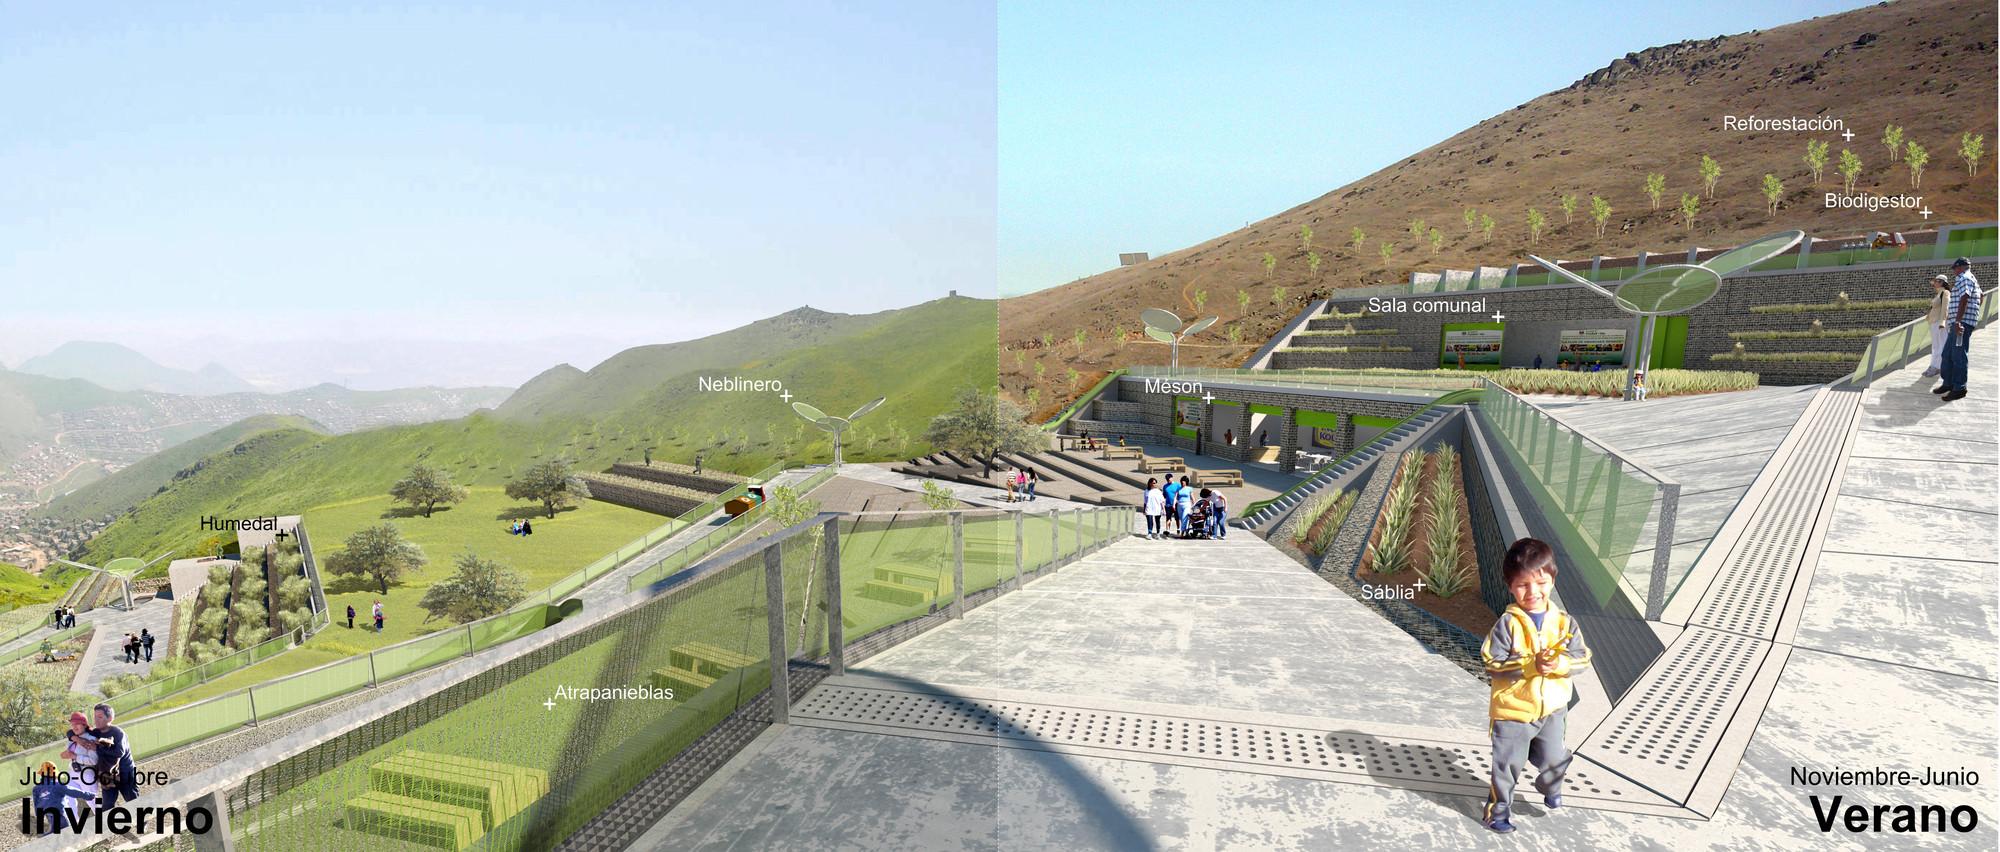 Primer lugar concurso juan gunther en lima per for Arquitectura de proyectos